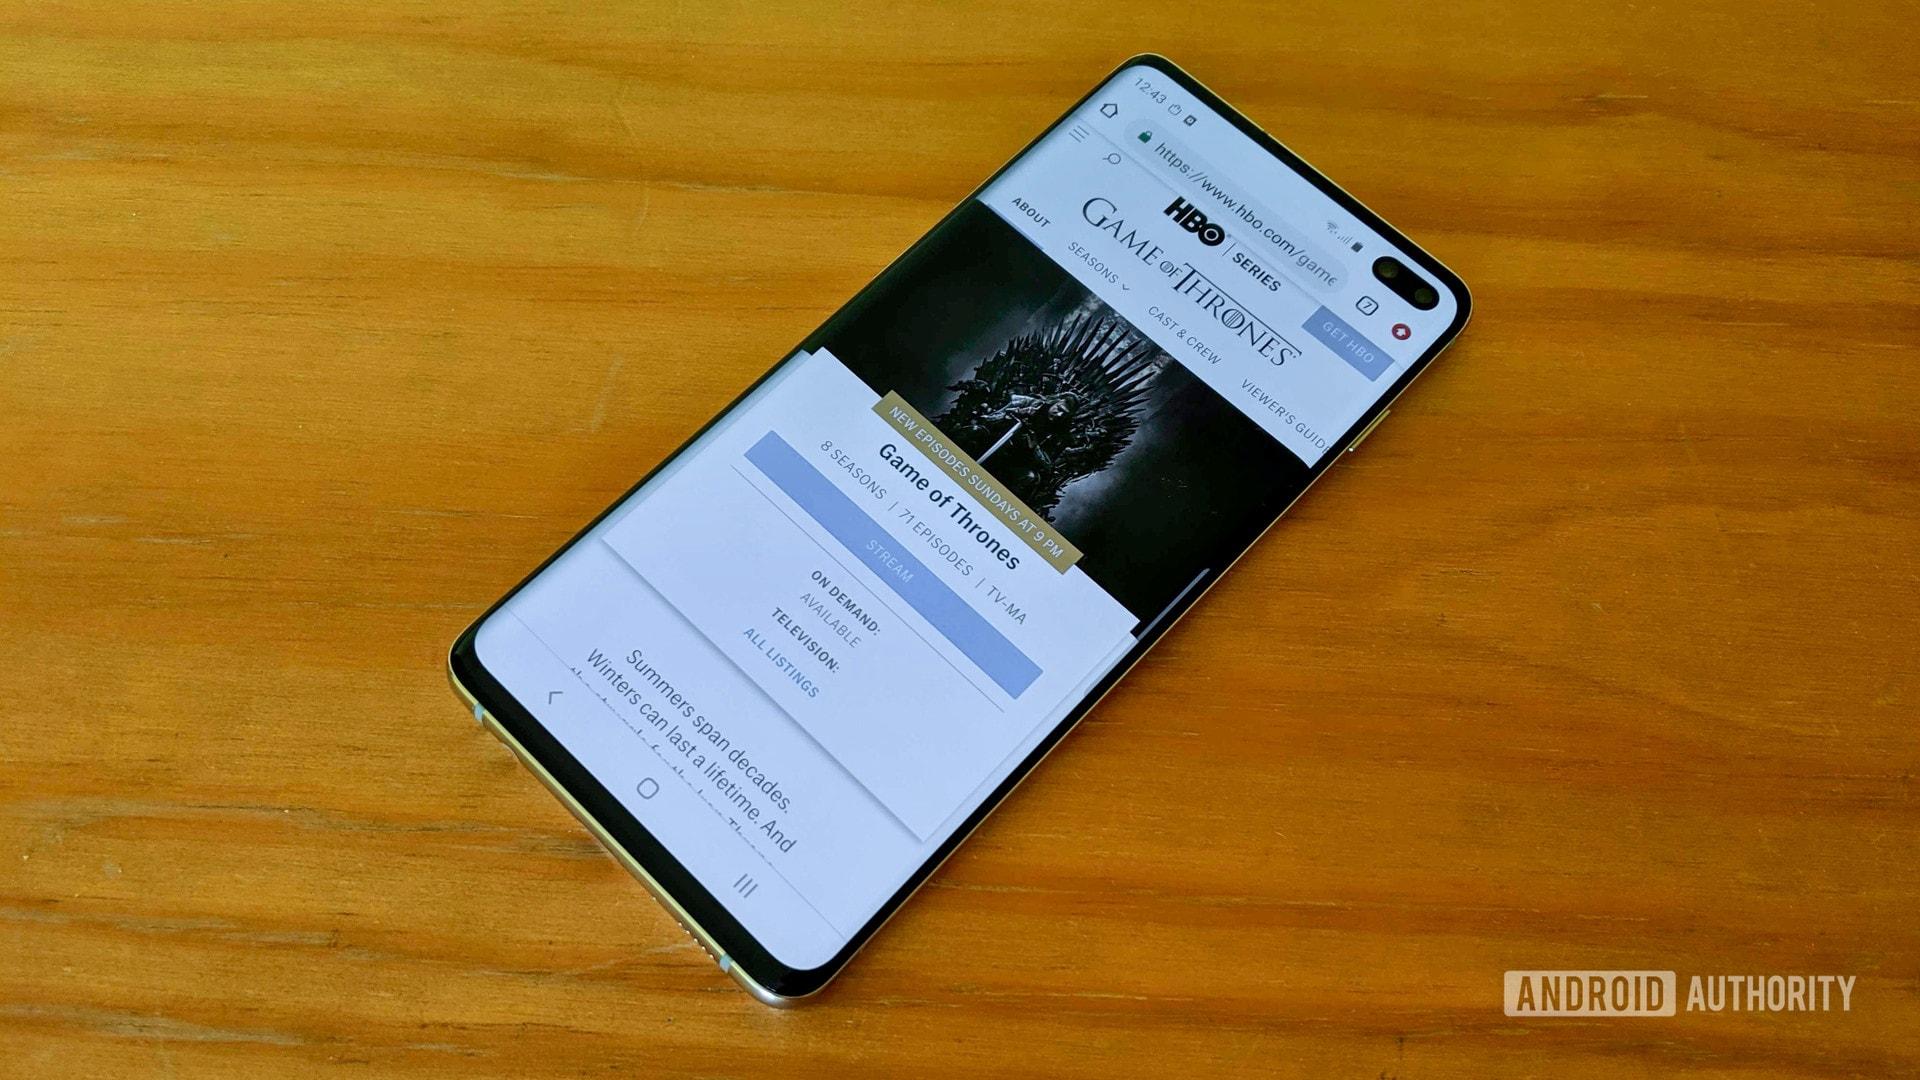 game of thrones website on Samsung Galaxy S10 Plus